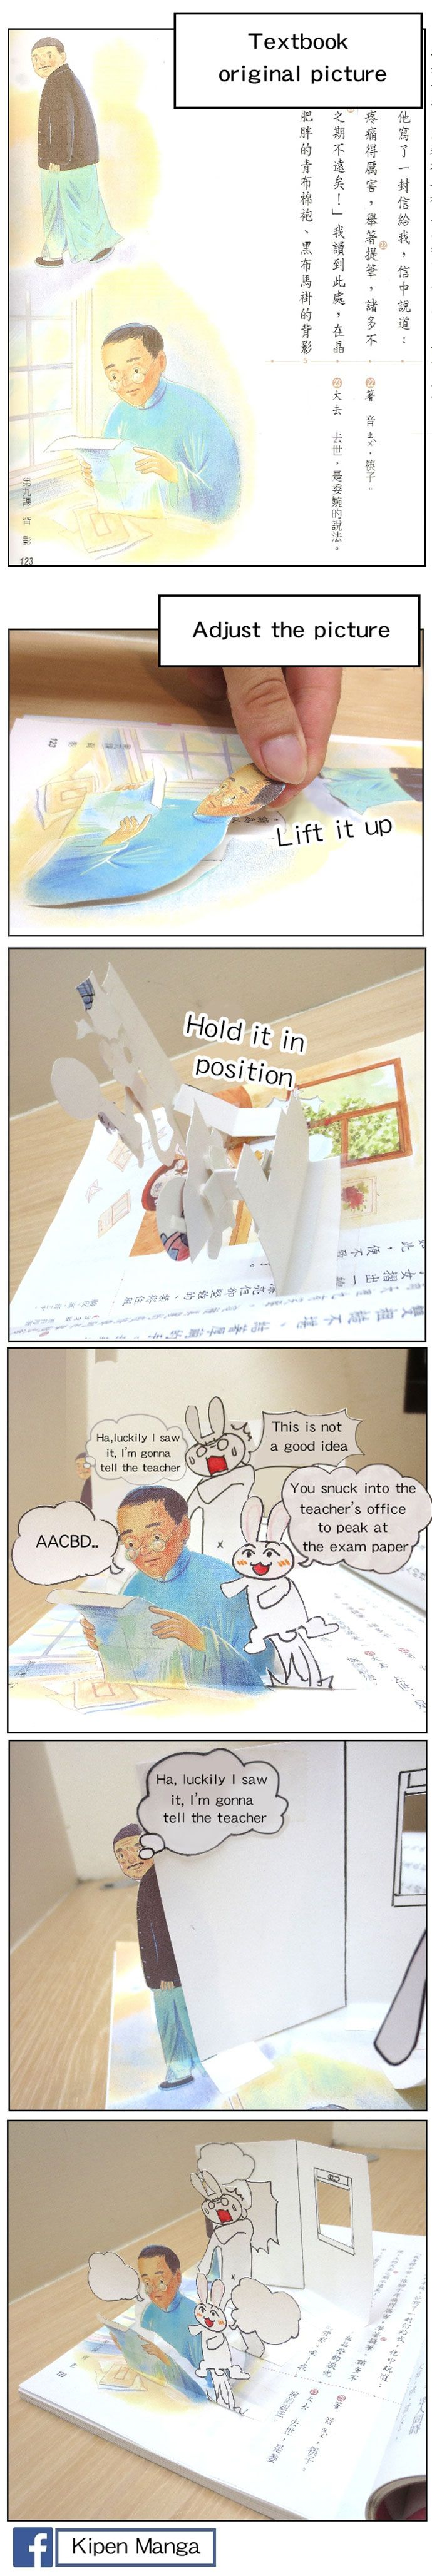 Kipen Manga - Textbook drawings